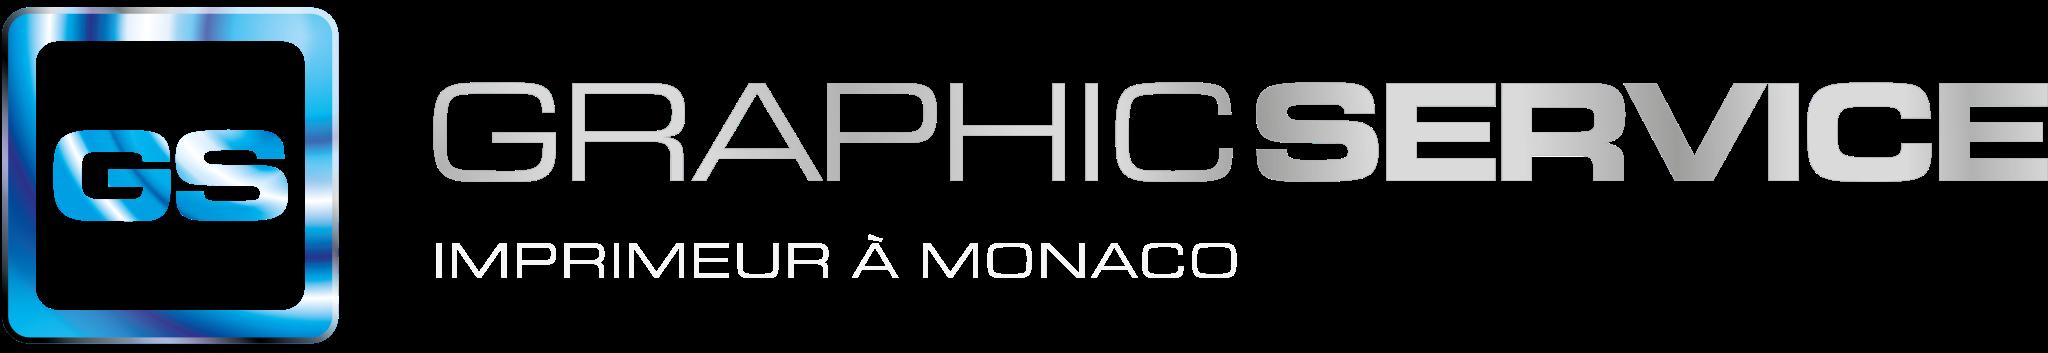 Graphic Service - Imprimeur Monaco